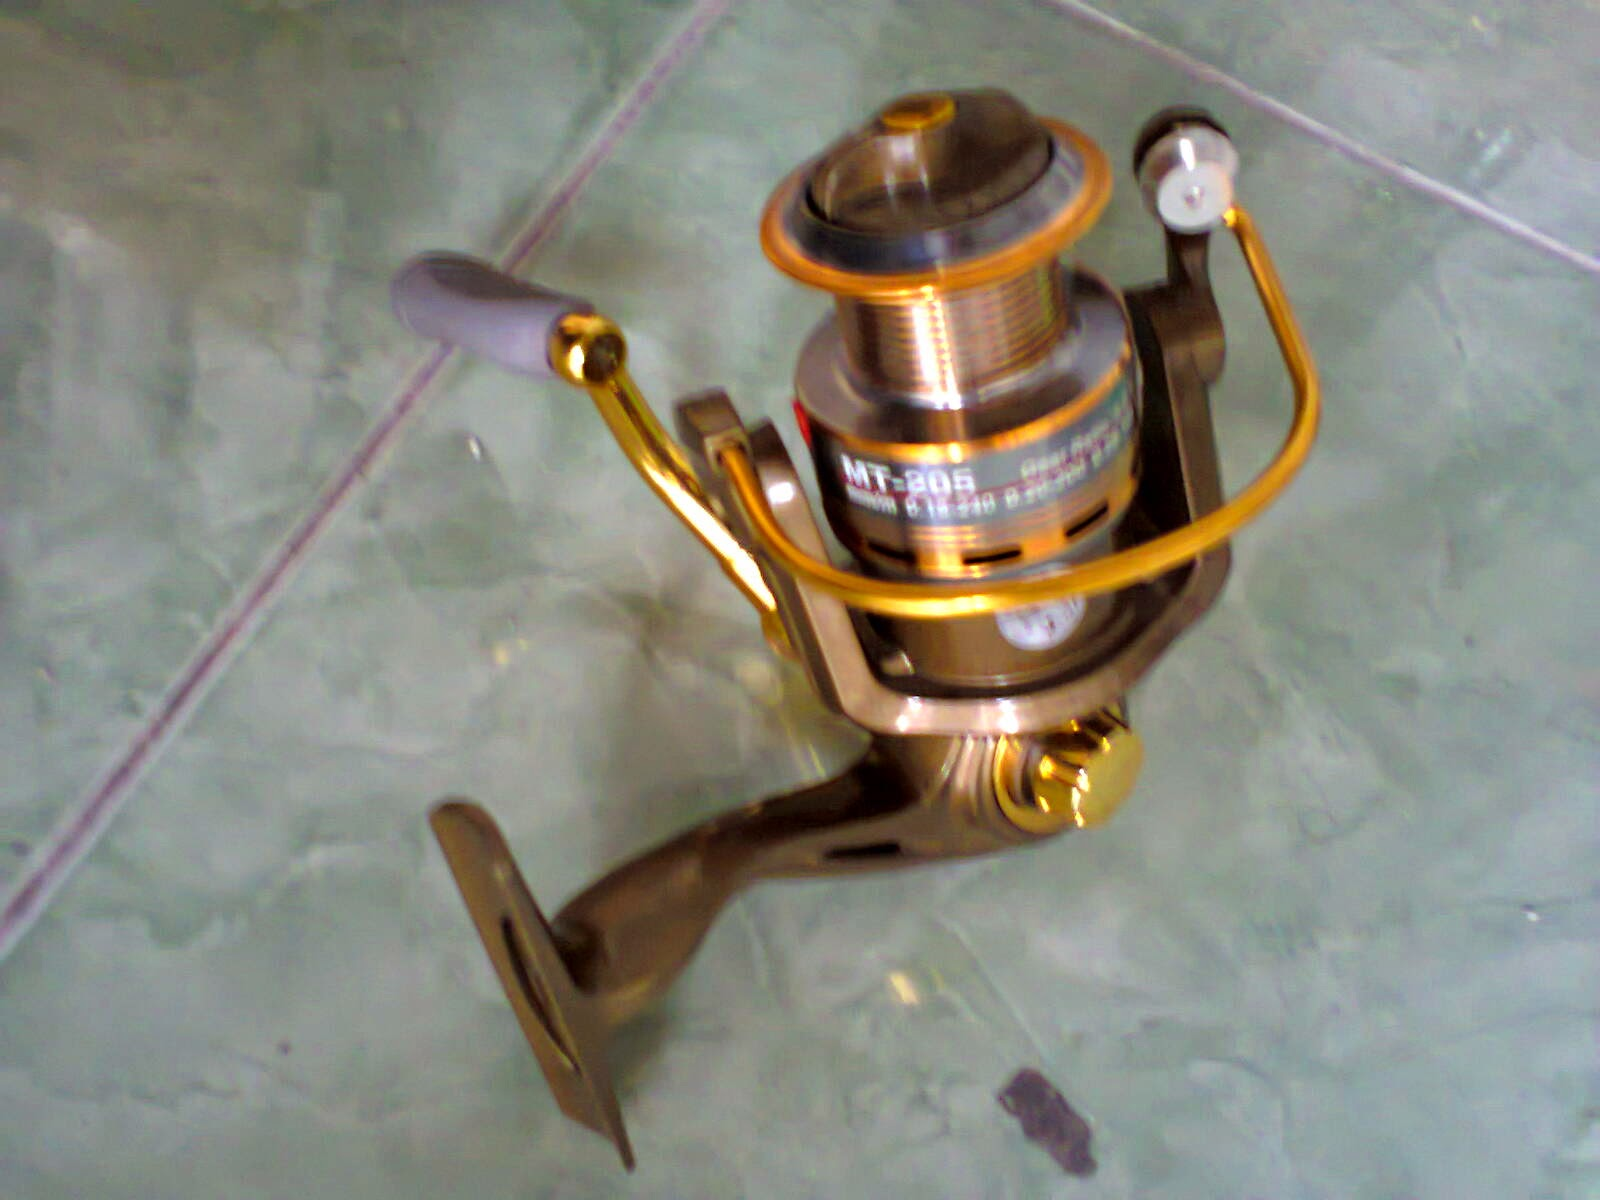 Gambar Reel Pancing GGolden Fish | Kuat Tidak Mahal | Info Tips Mancing Jambal / Patin di sungai